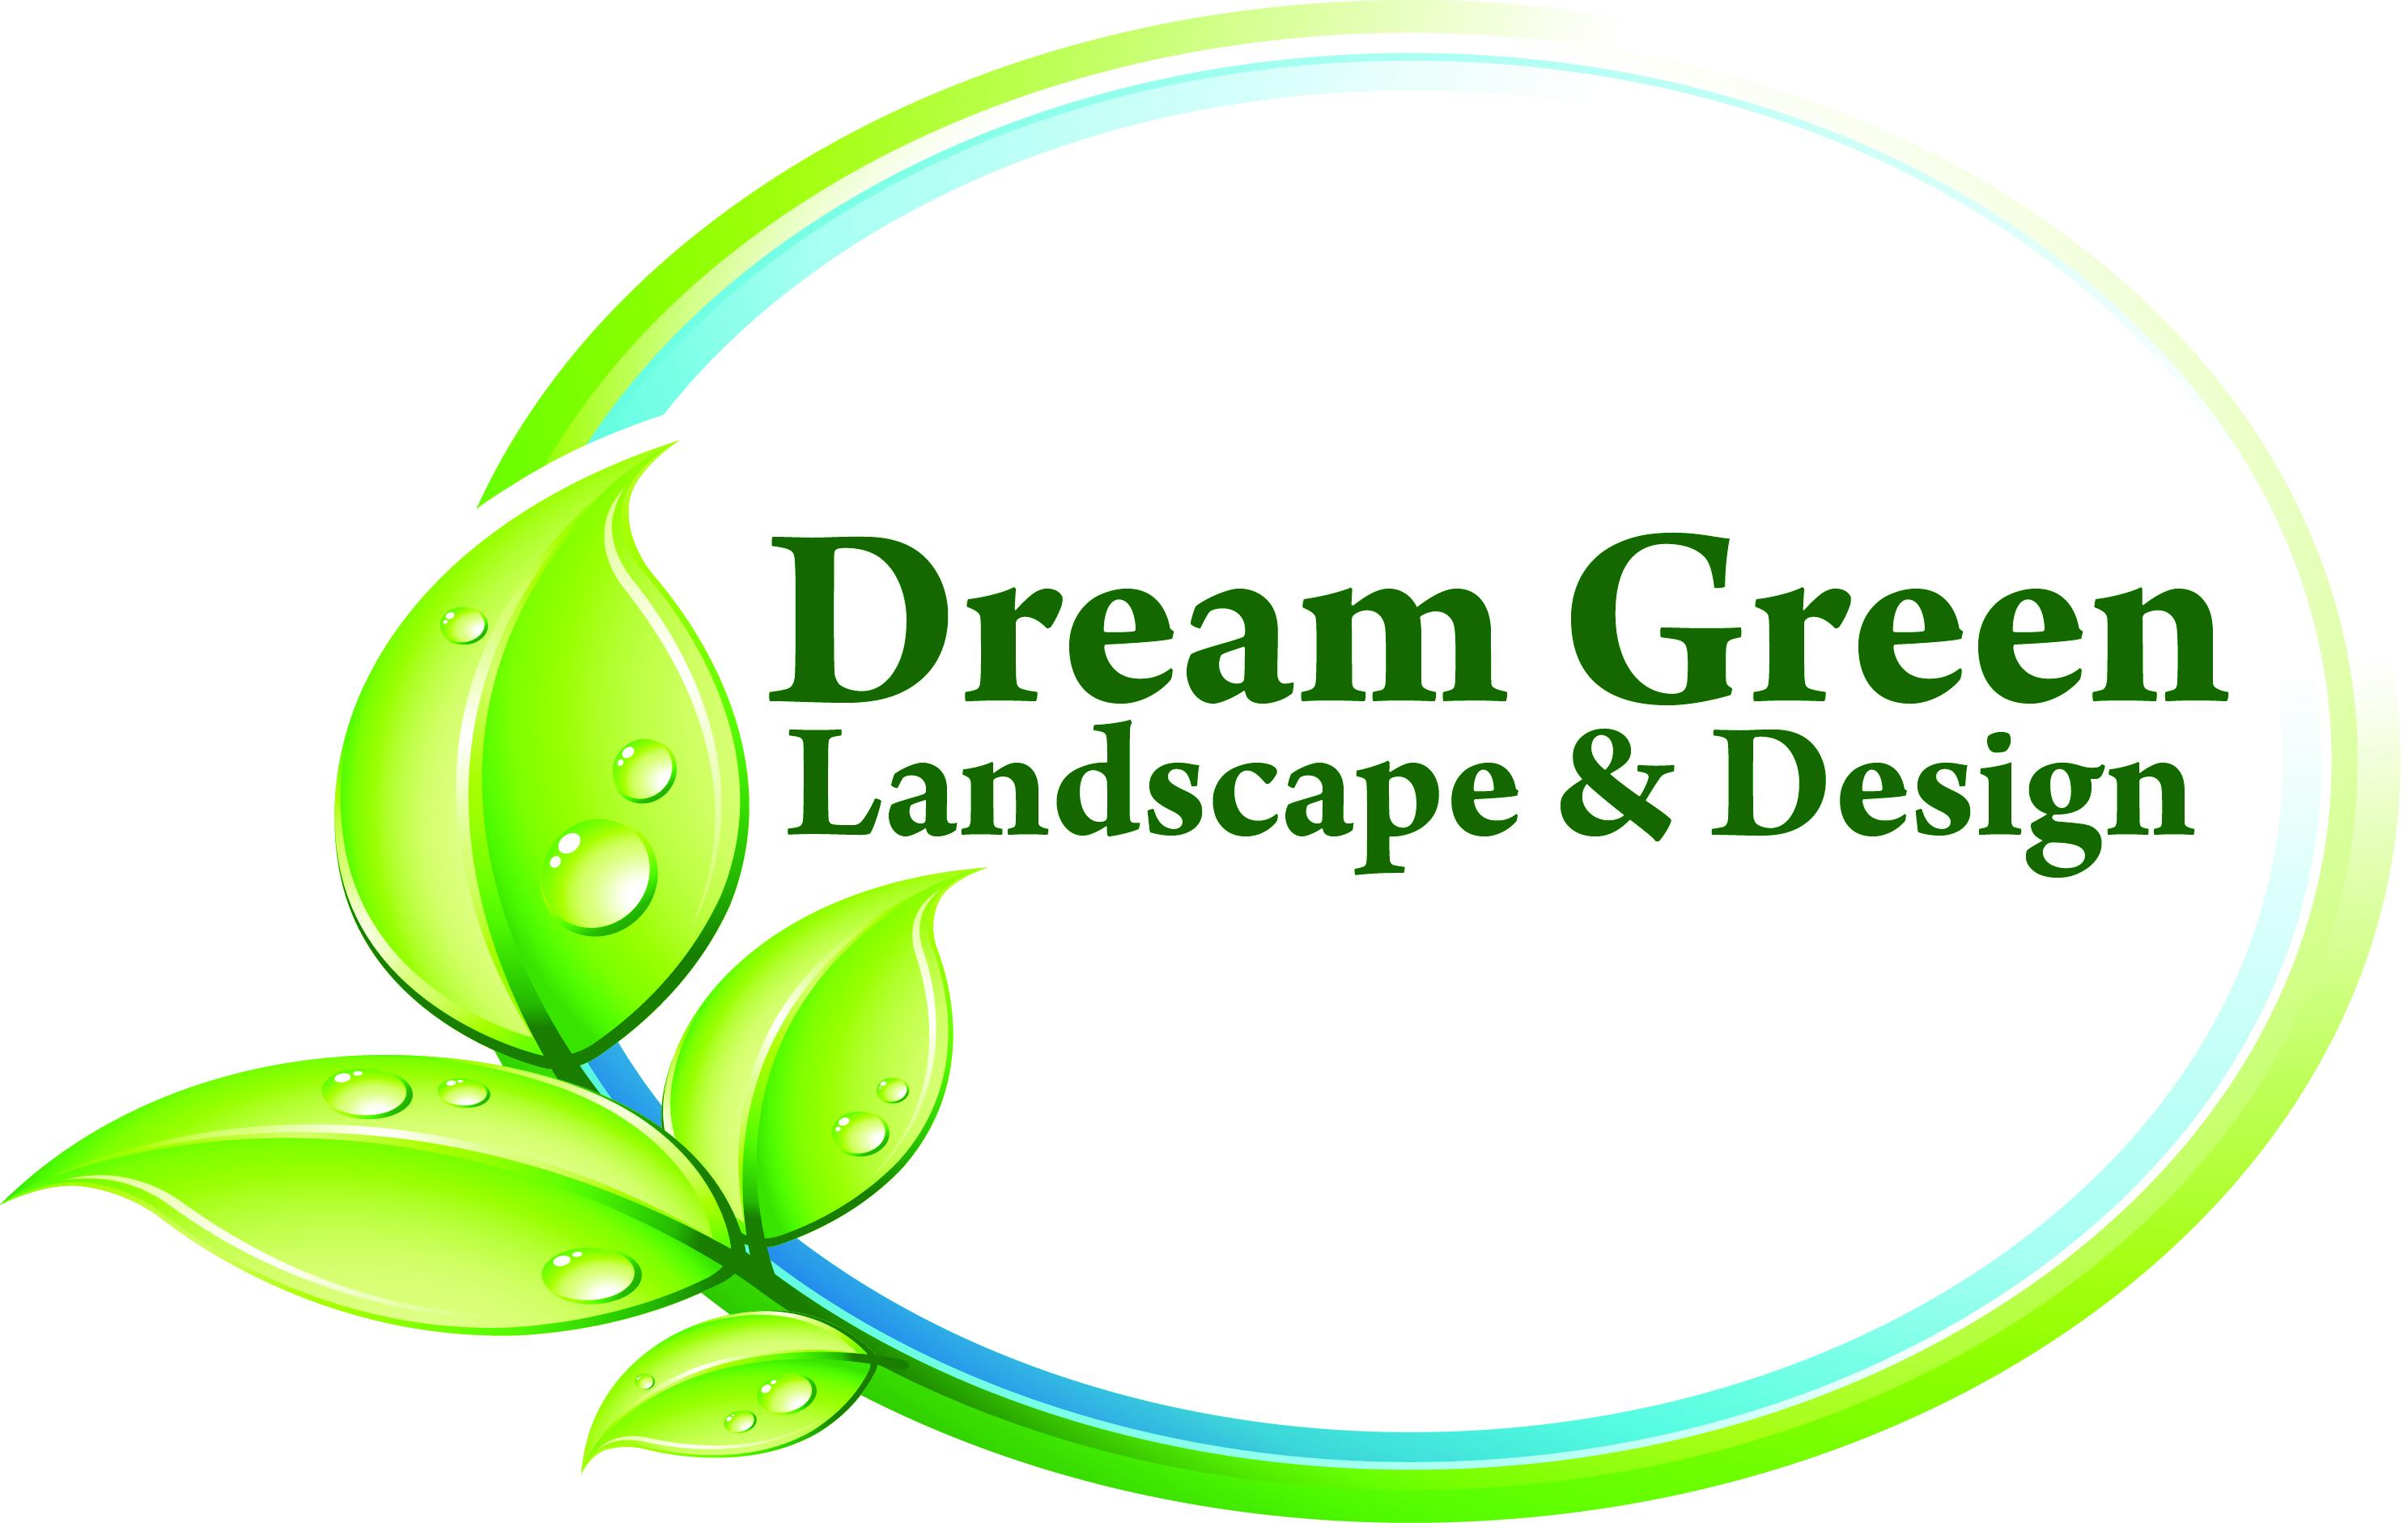 Logos - Turner Custom Design, Inc.